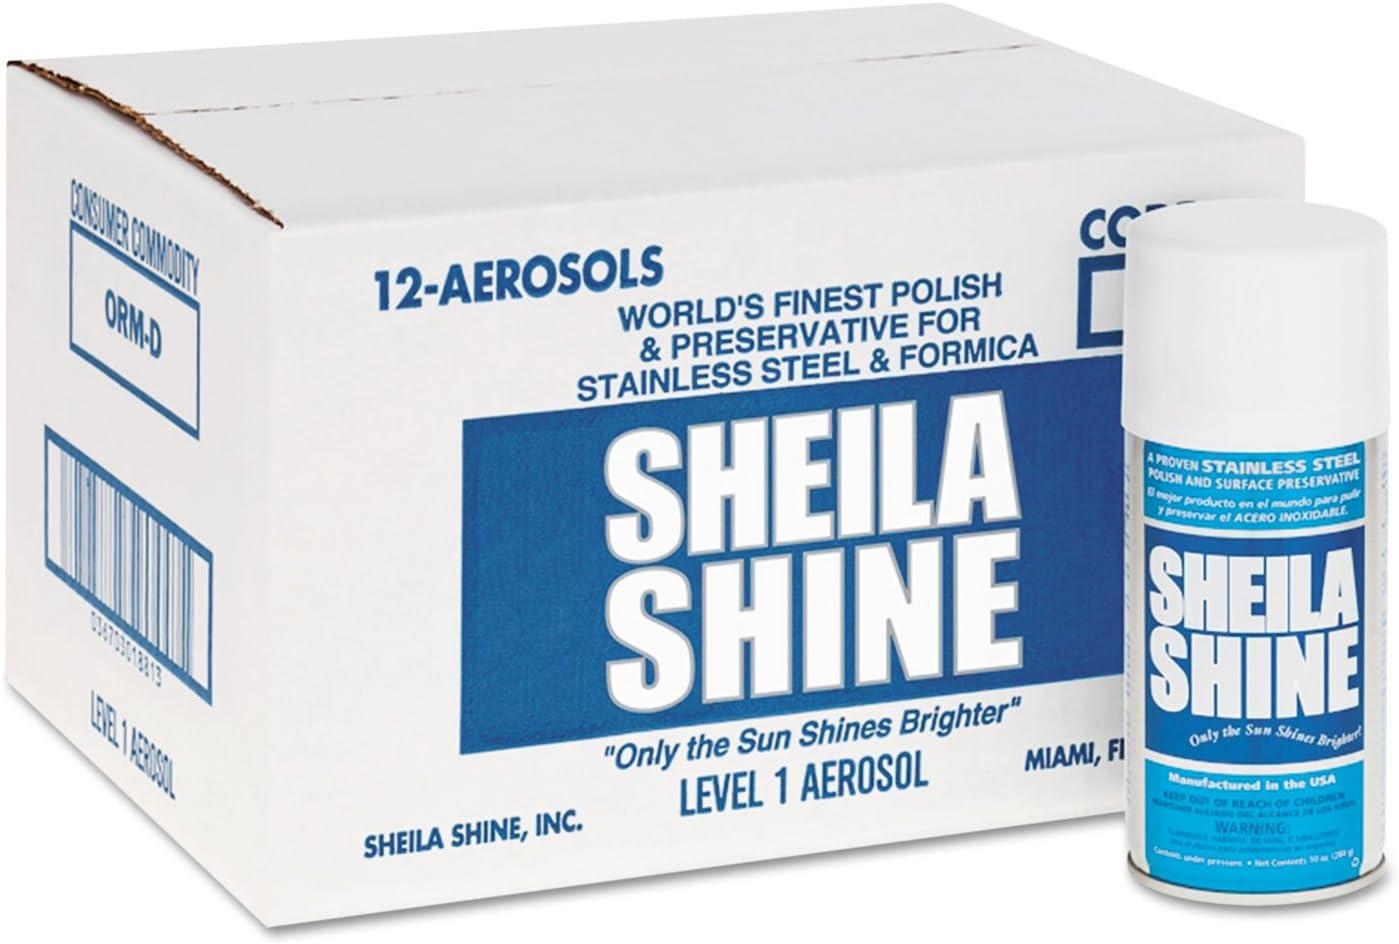 Sheila Shine Stainless Steel Cleaner & Polish, 10 oz. Aerosol Can, 12/Carton